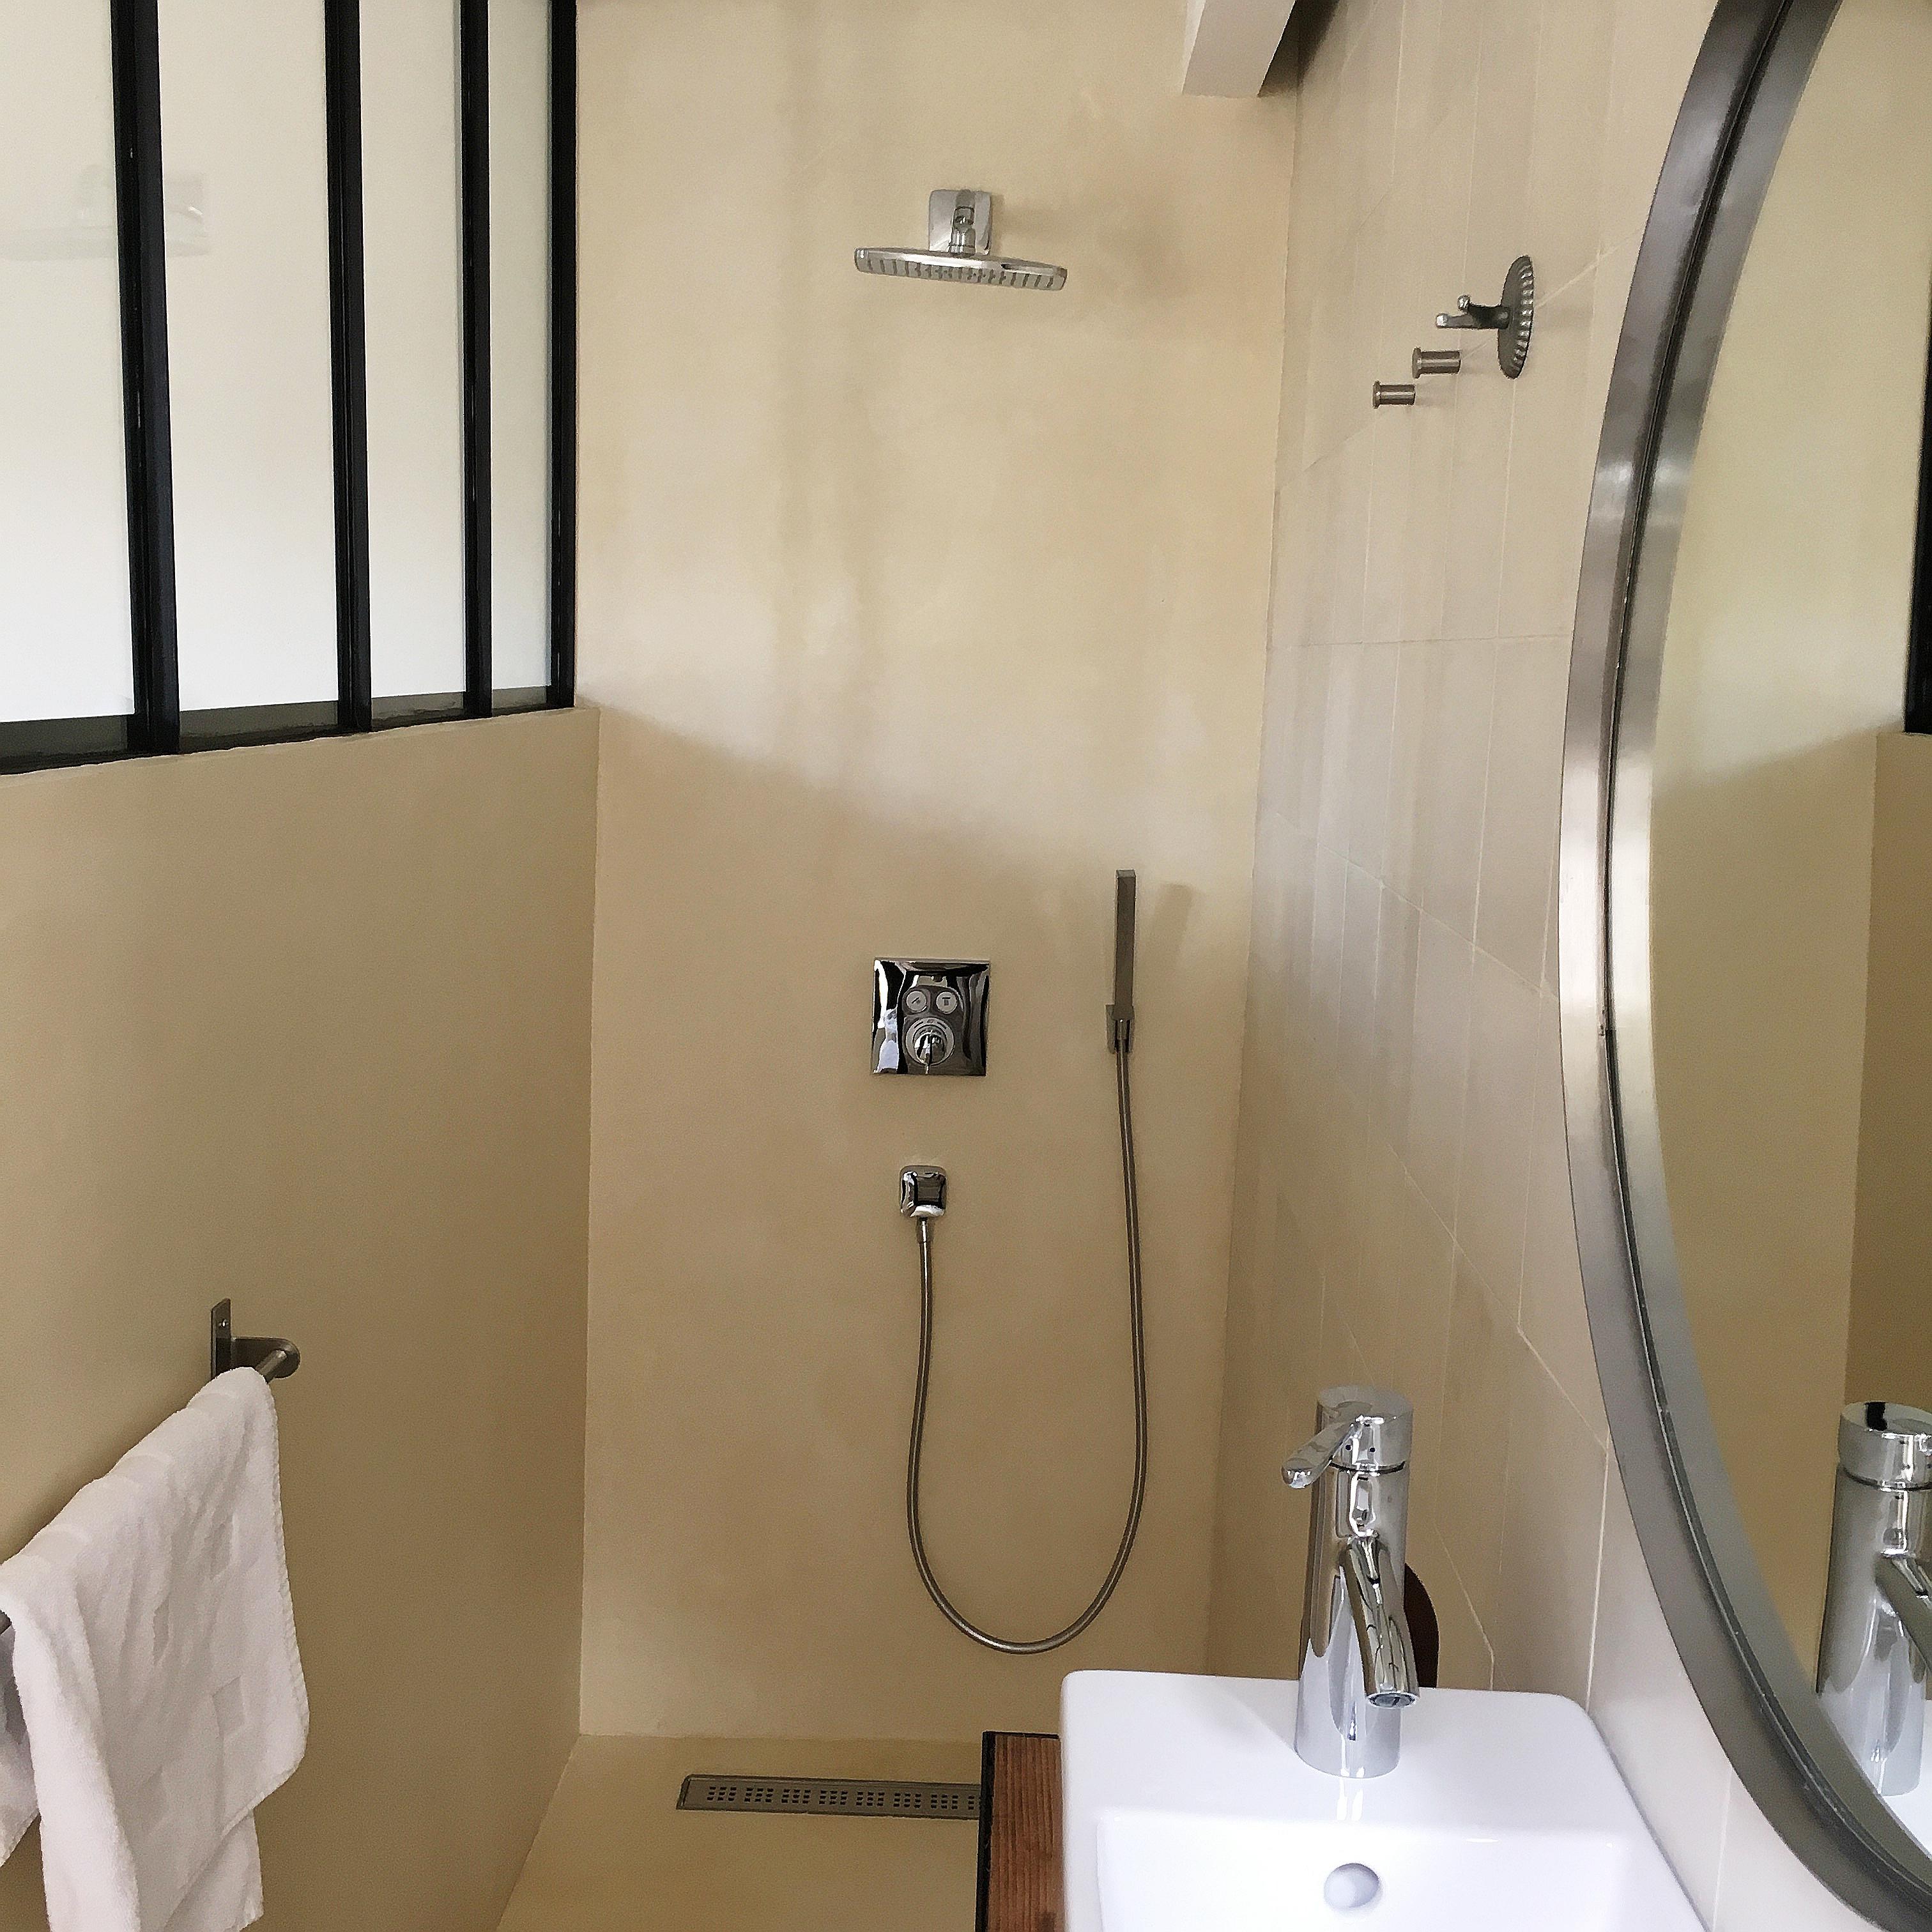 chez laurence du tilly adresse secr te mahousindeco. Black Bedroom Furniture Sets. Home Design Ideas